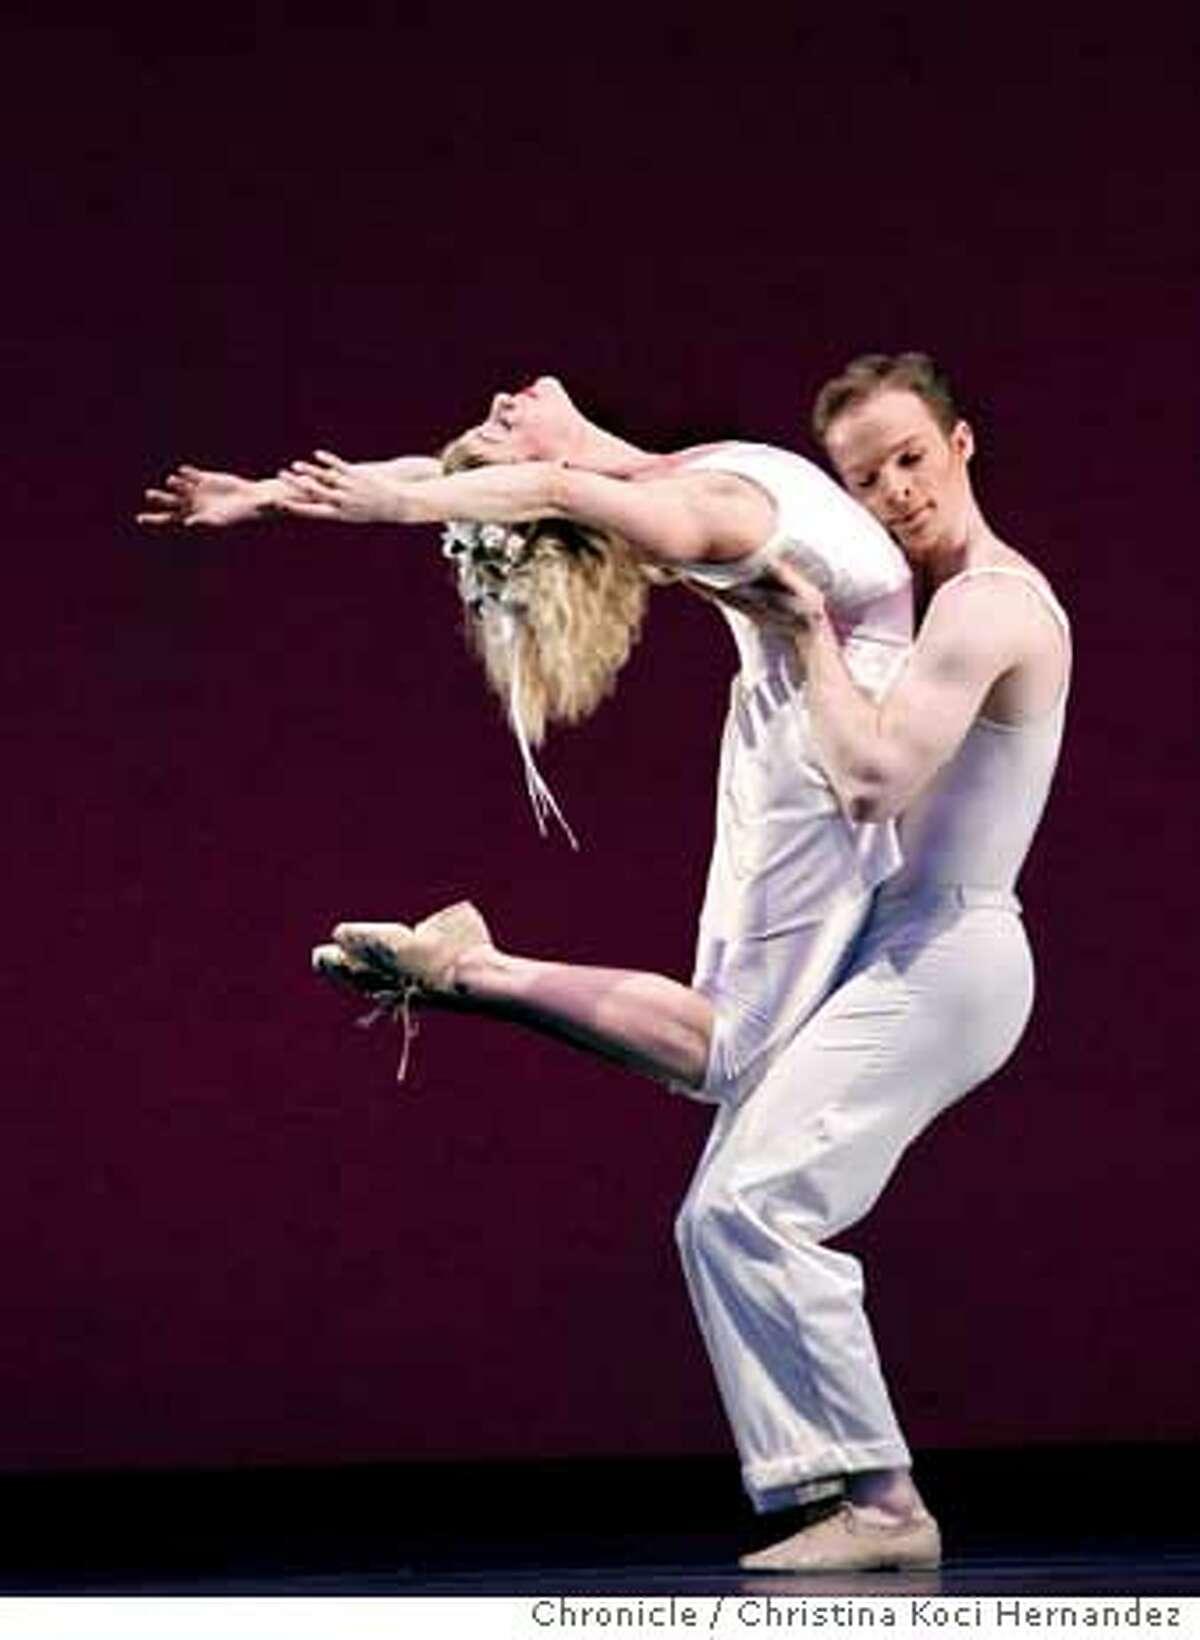 Elizabeth Miner and (R) Matthew Stewart.The San Francisco Ballet dress rehersal schedule for Program 5 for review .CHRISTINA KOCI HERNANDEZ/CHRONICLE